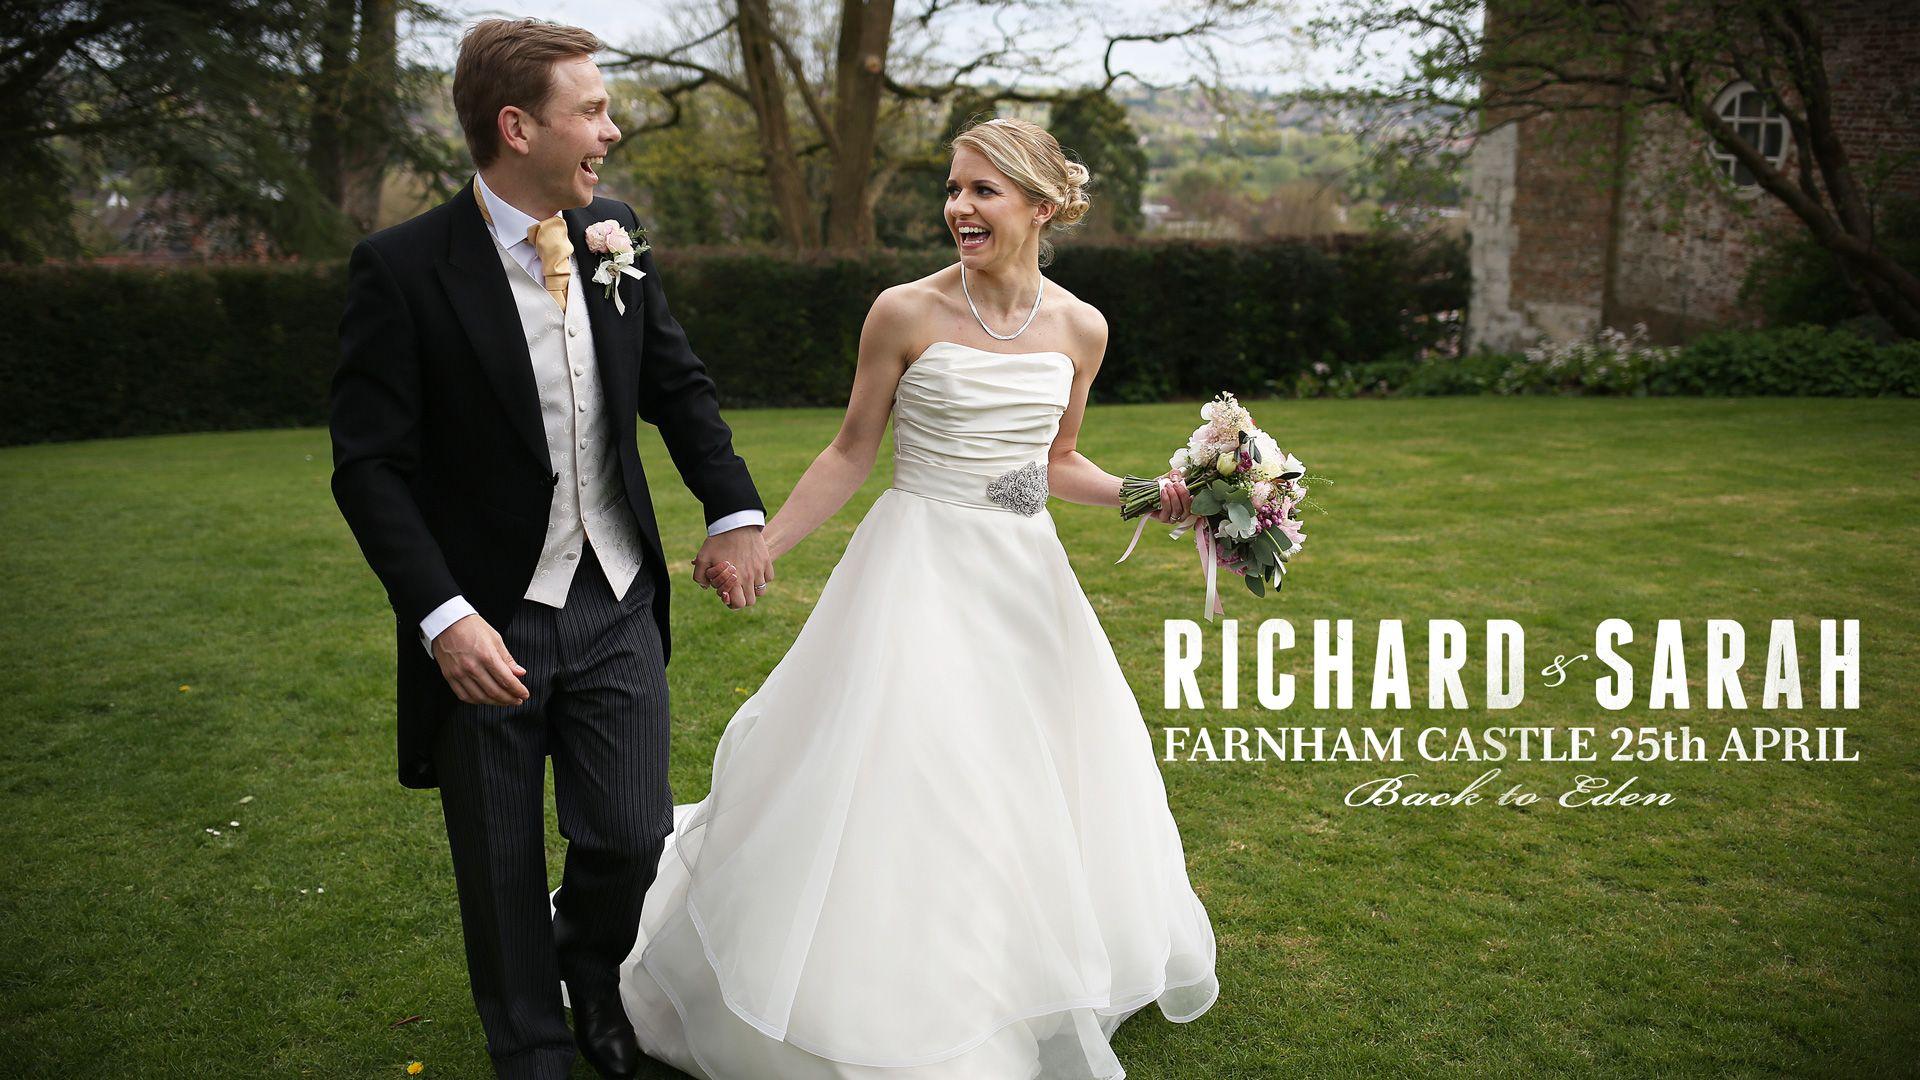 Richard and sarah april farnham castle wedding videos